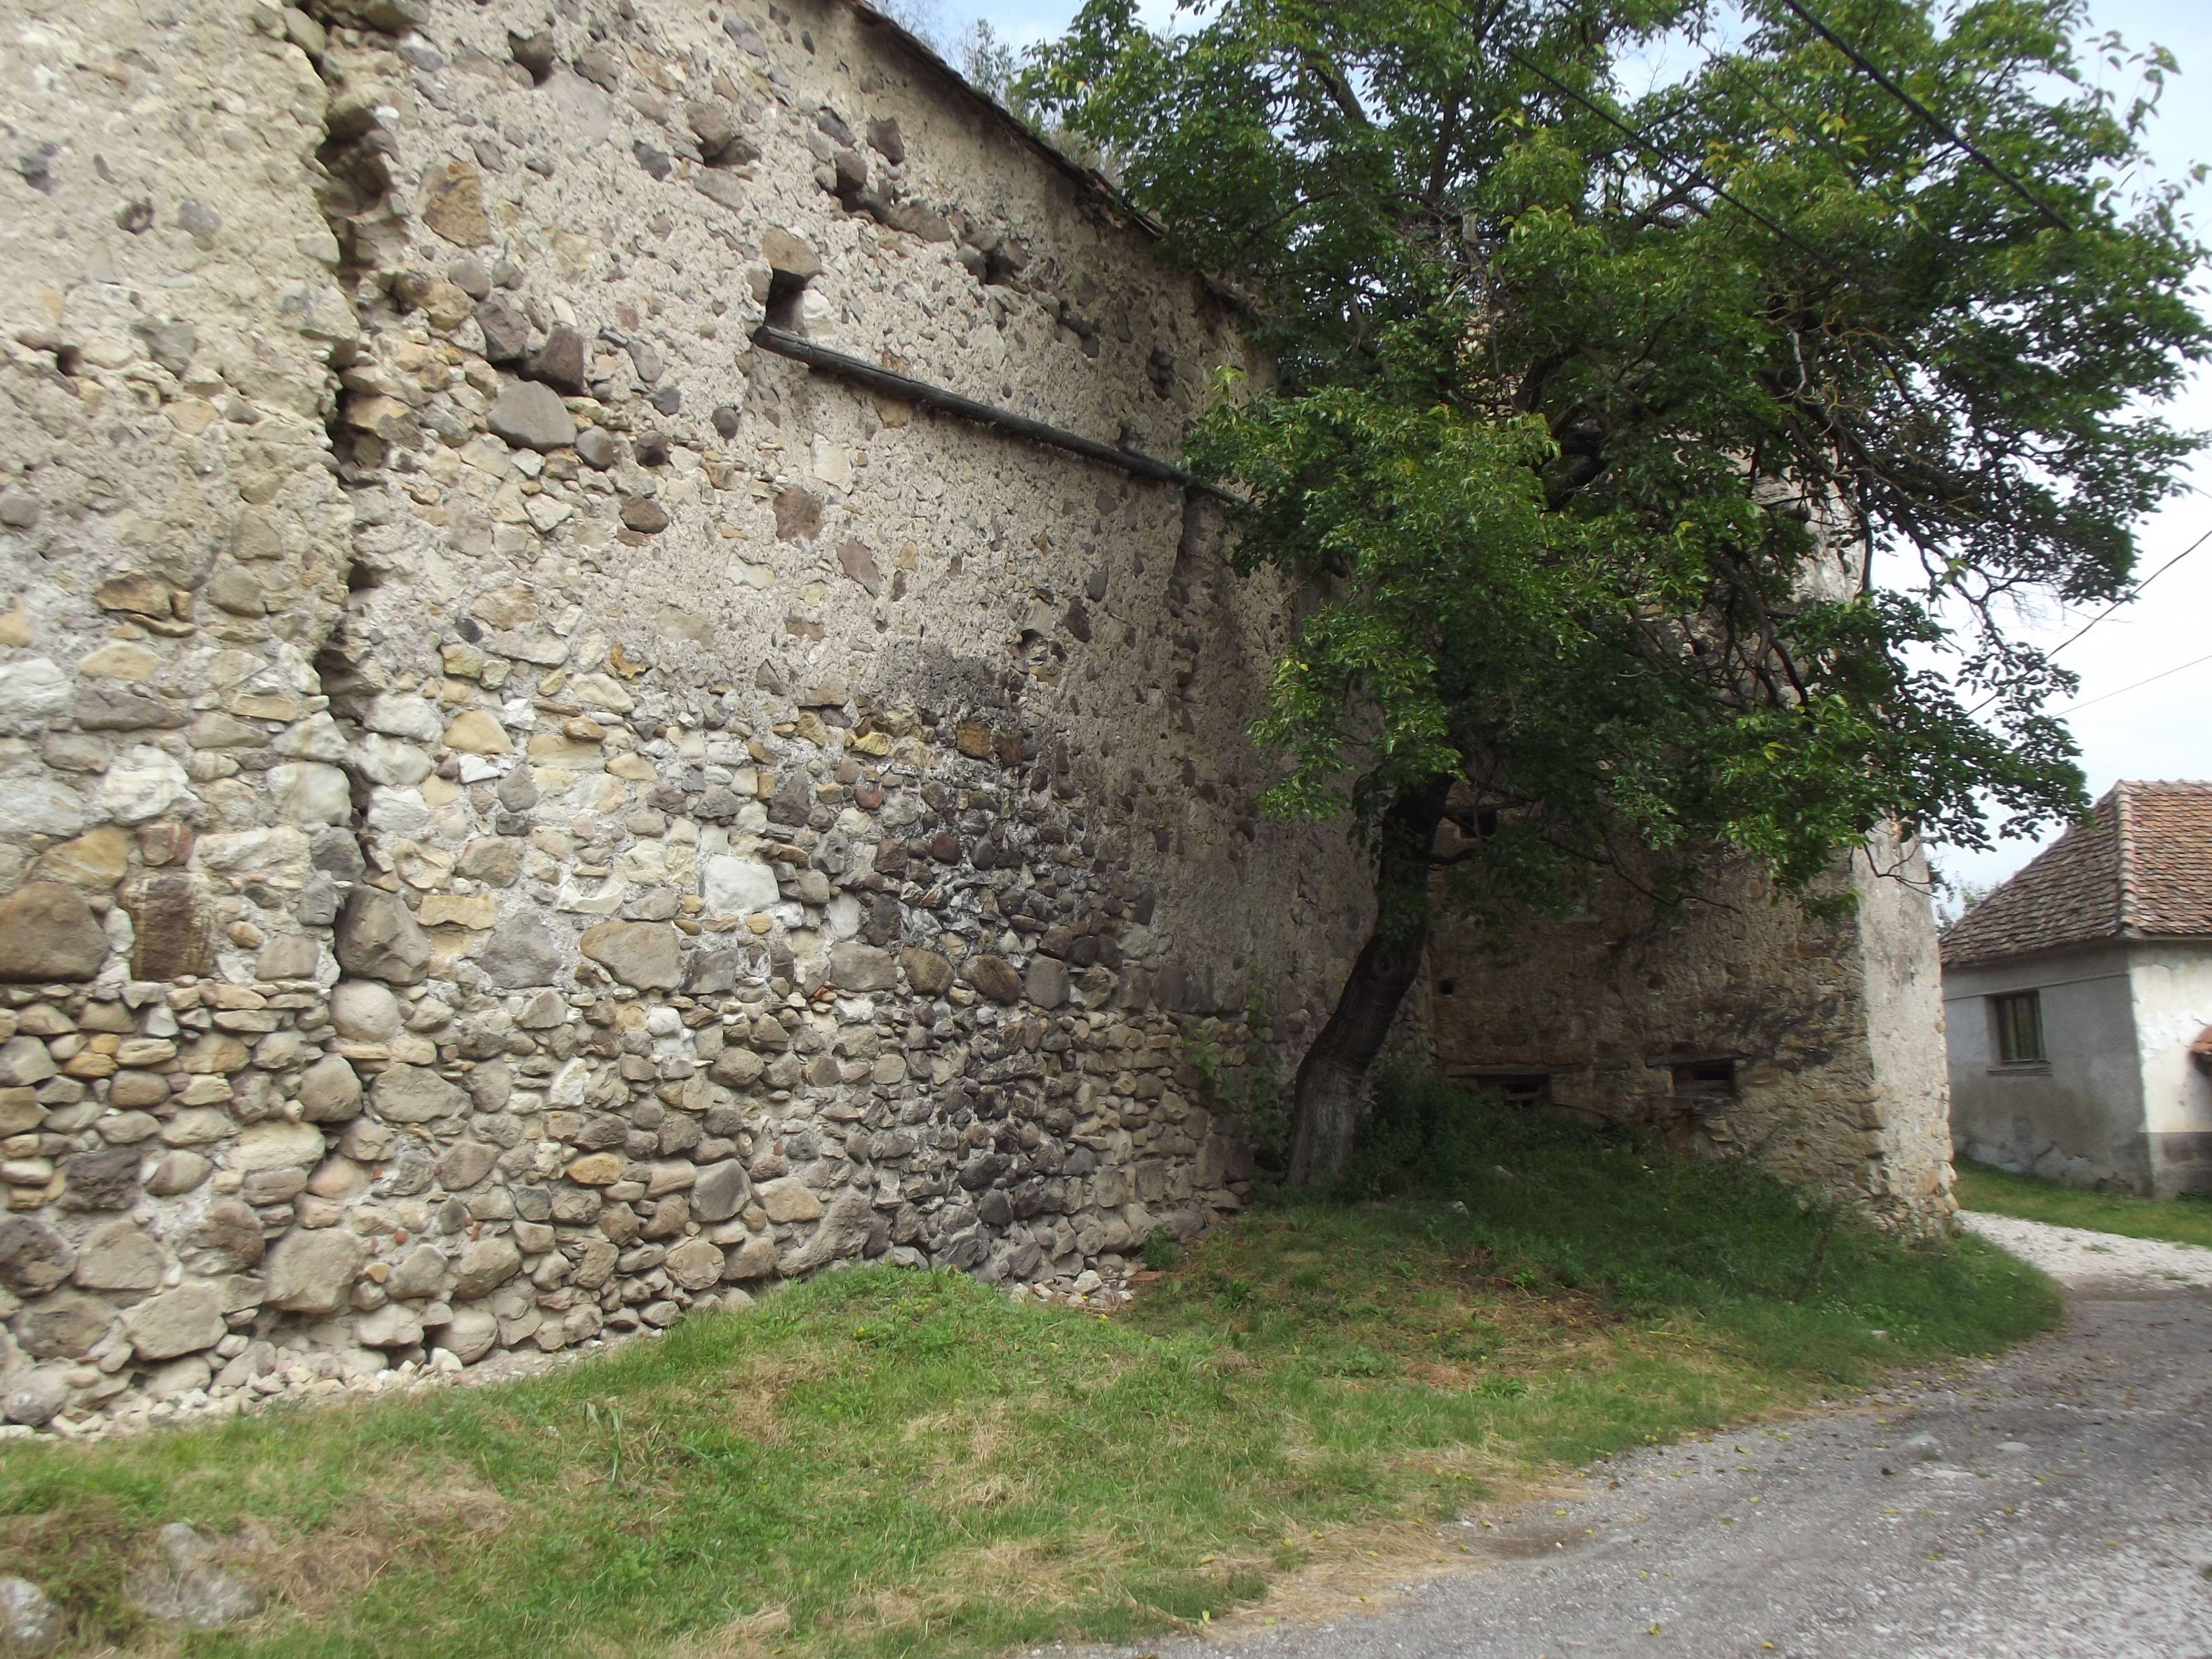 Homoróddaróc, hatalmas repedés a falon